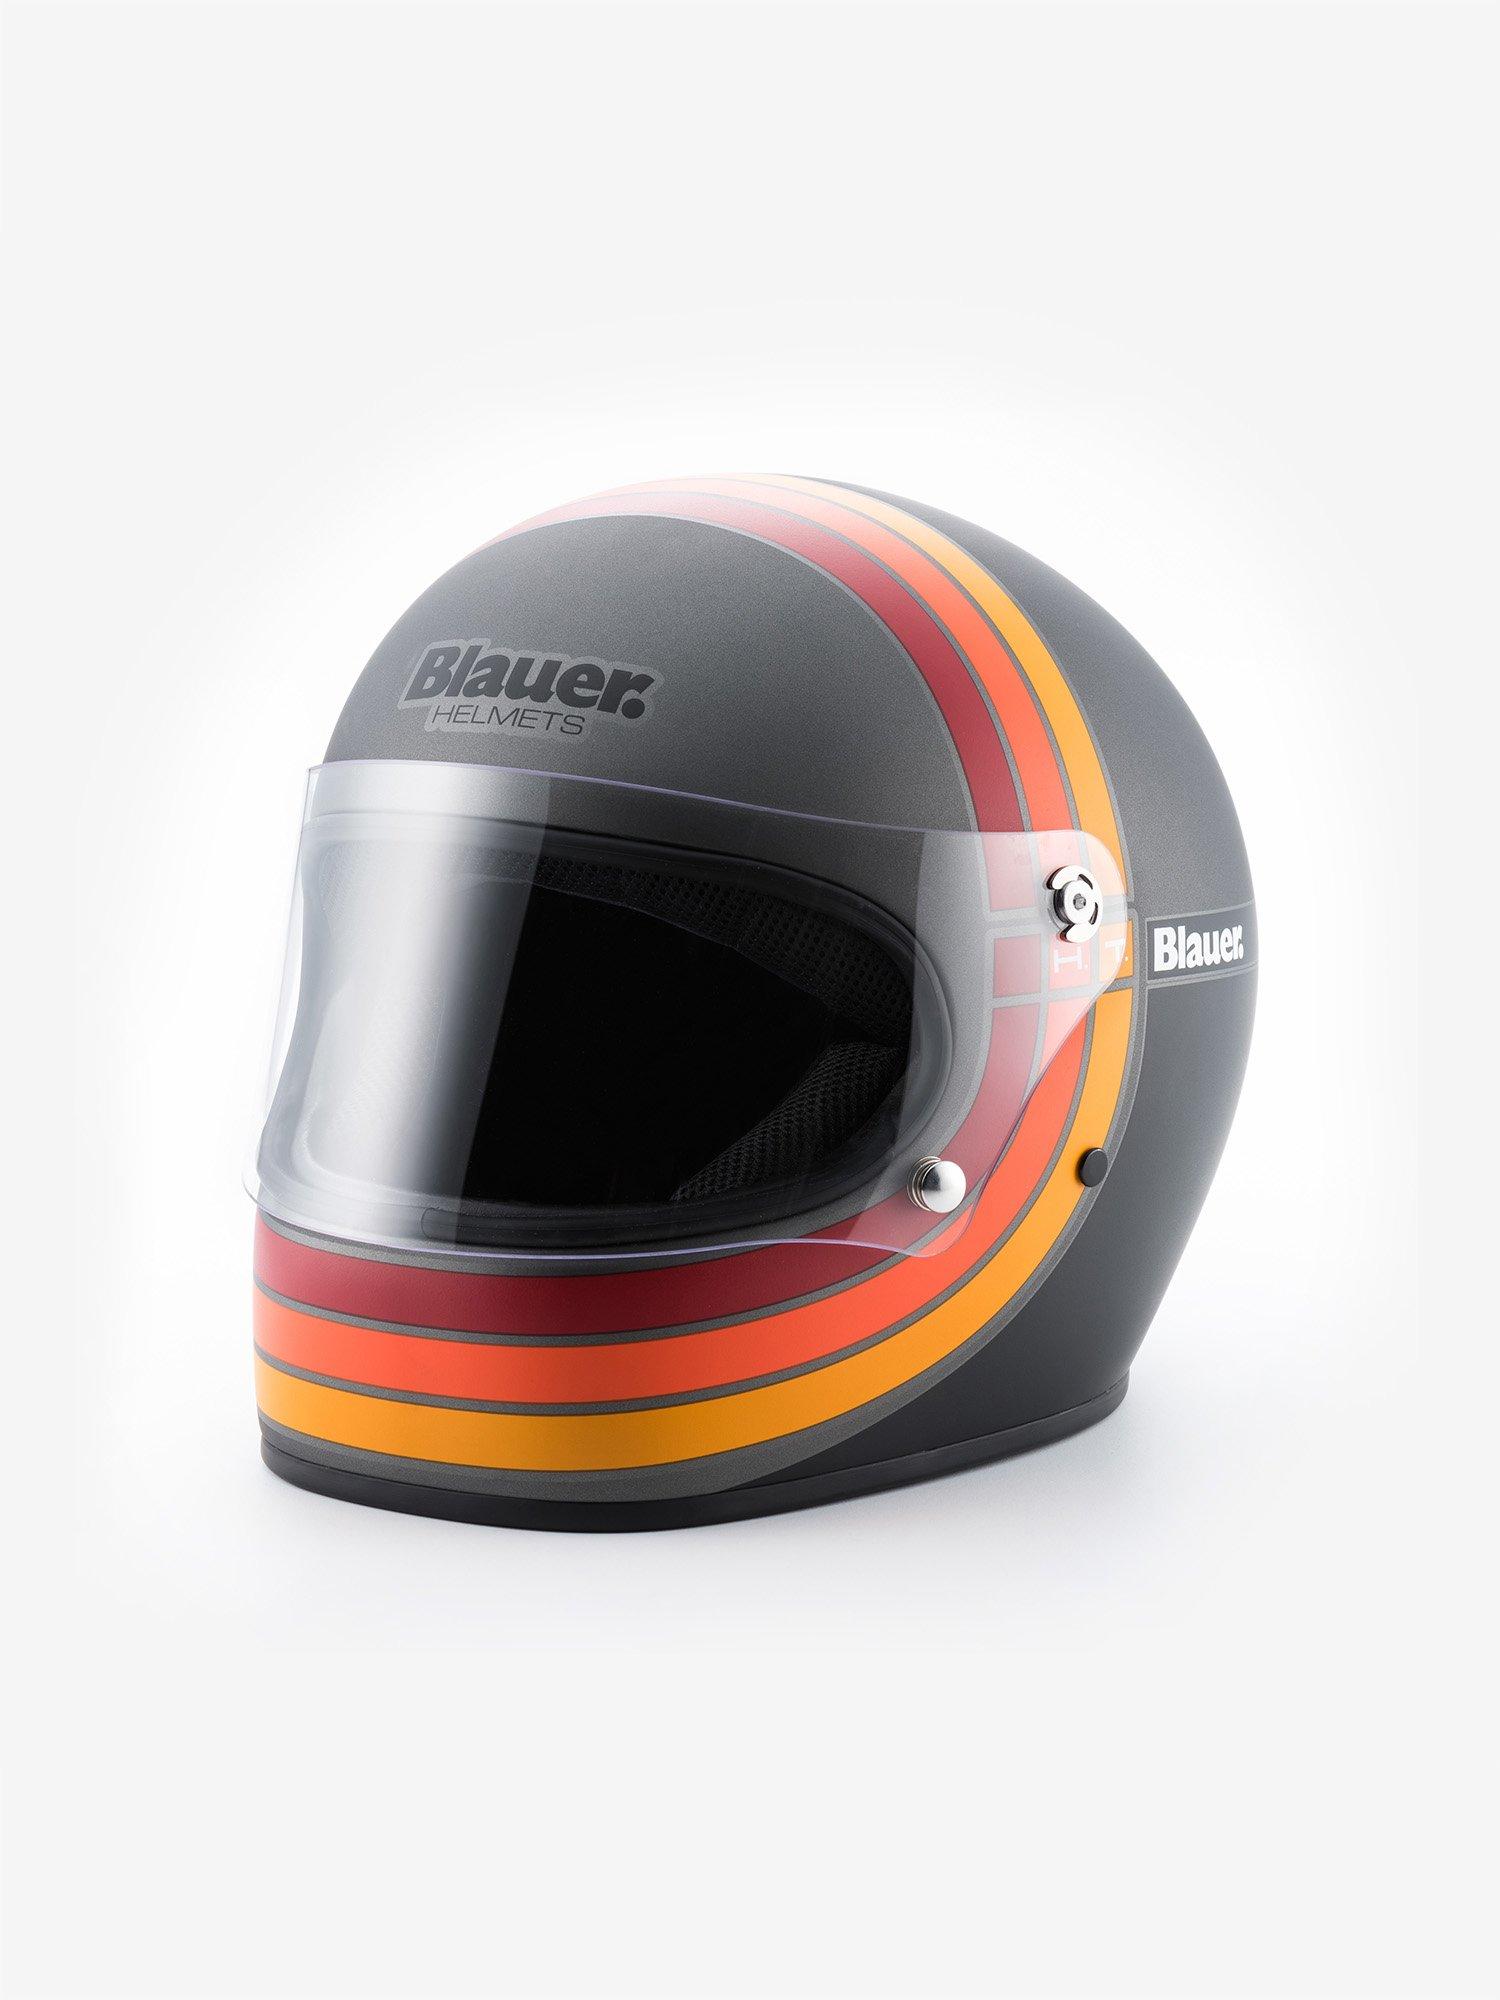 Blauer - CASCO 80s - Titanium Matt - Blauer